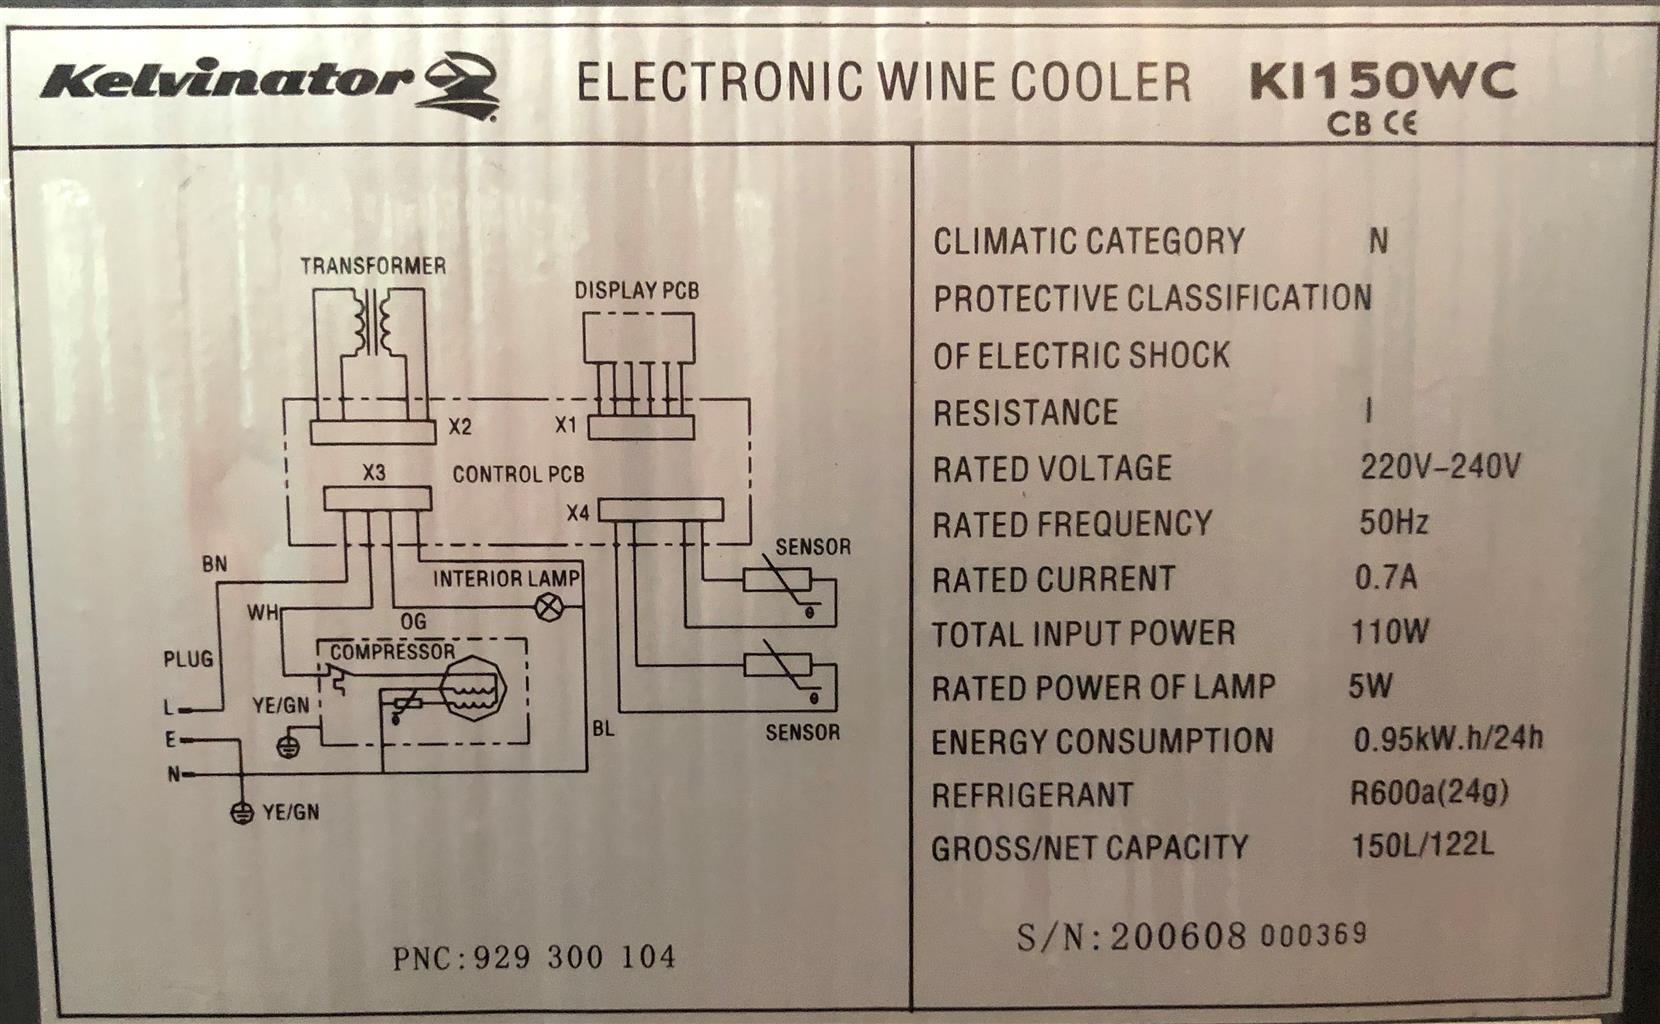 Kelvinator Electronic Wine Cooler